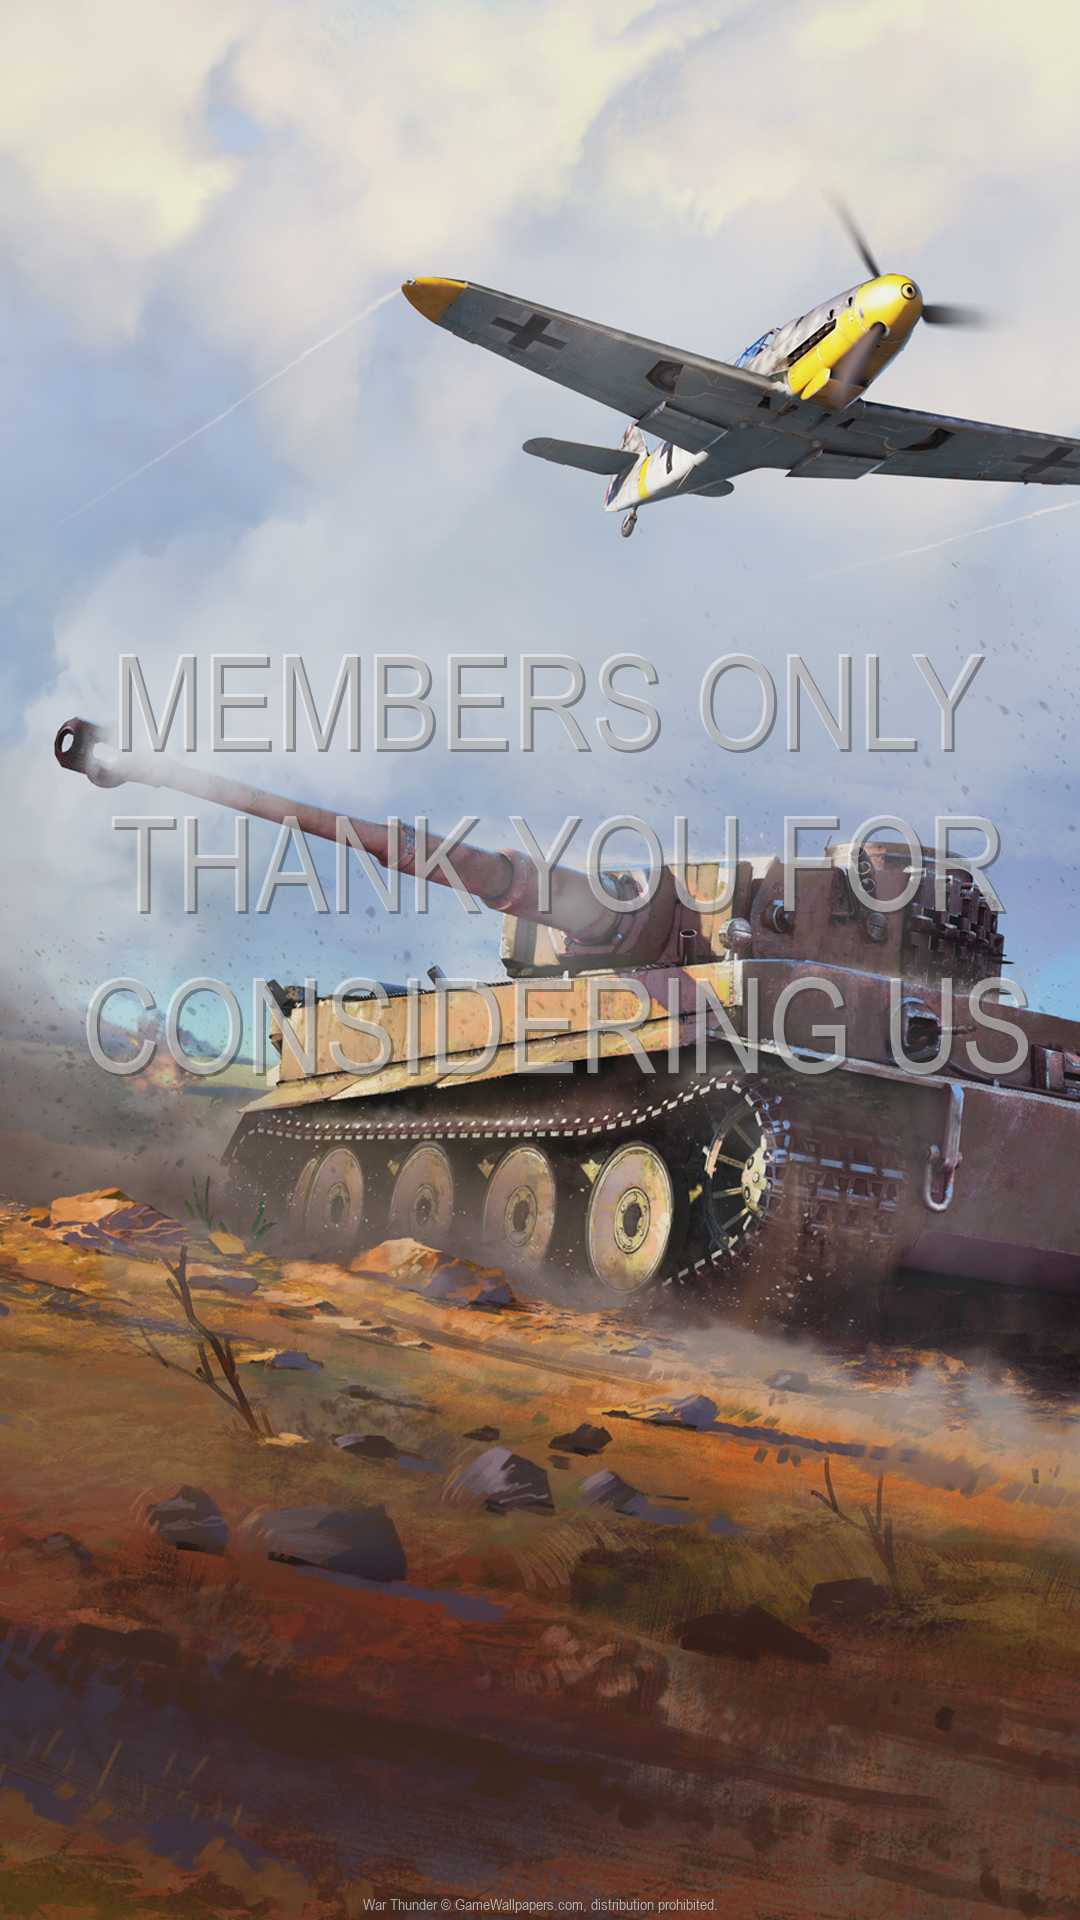 War Thunder 1080p Vertical Mobile wallpaper or background 02